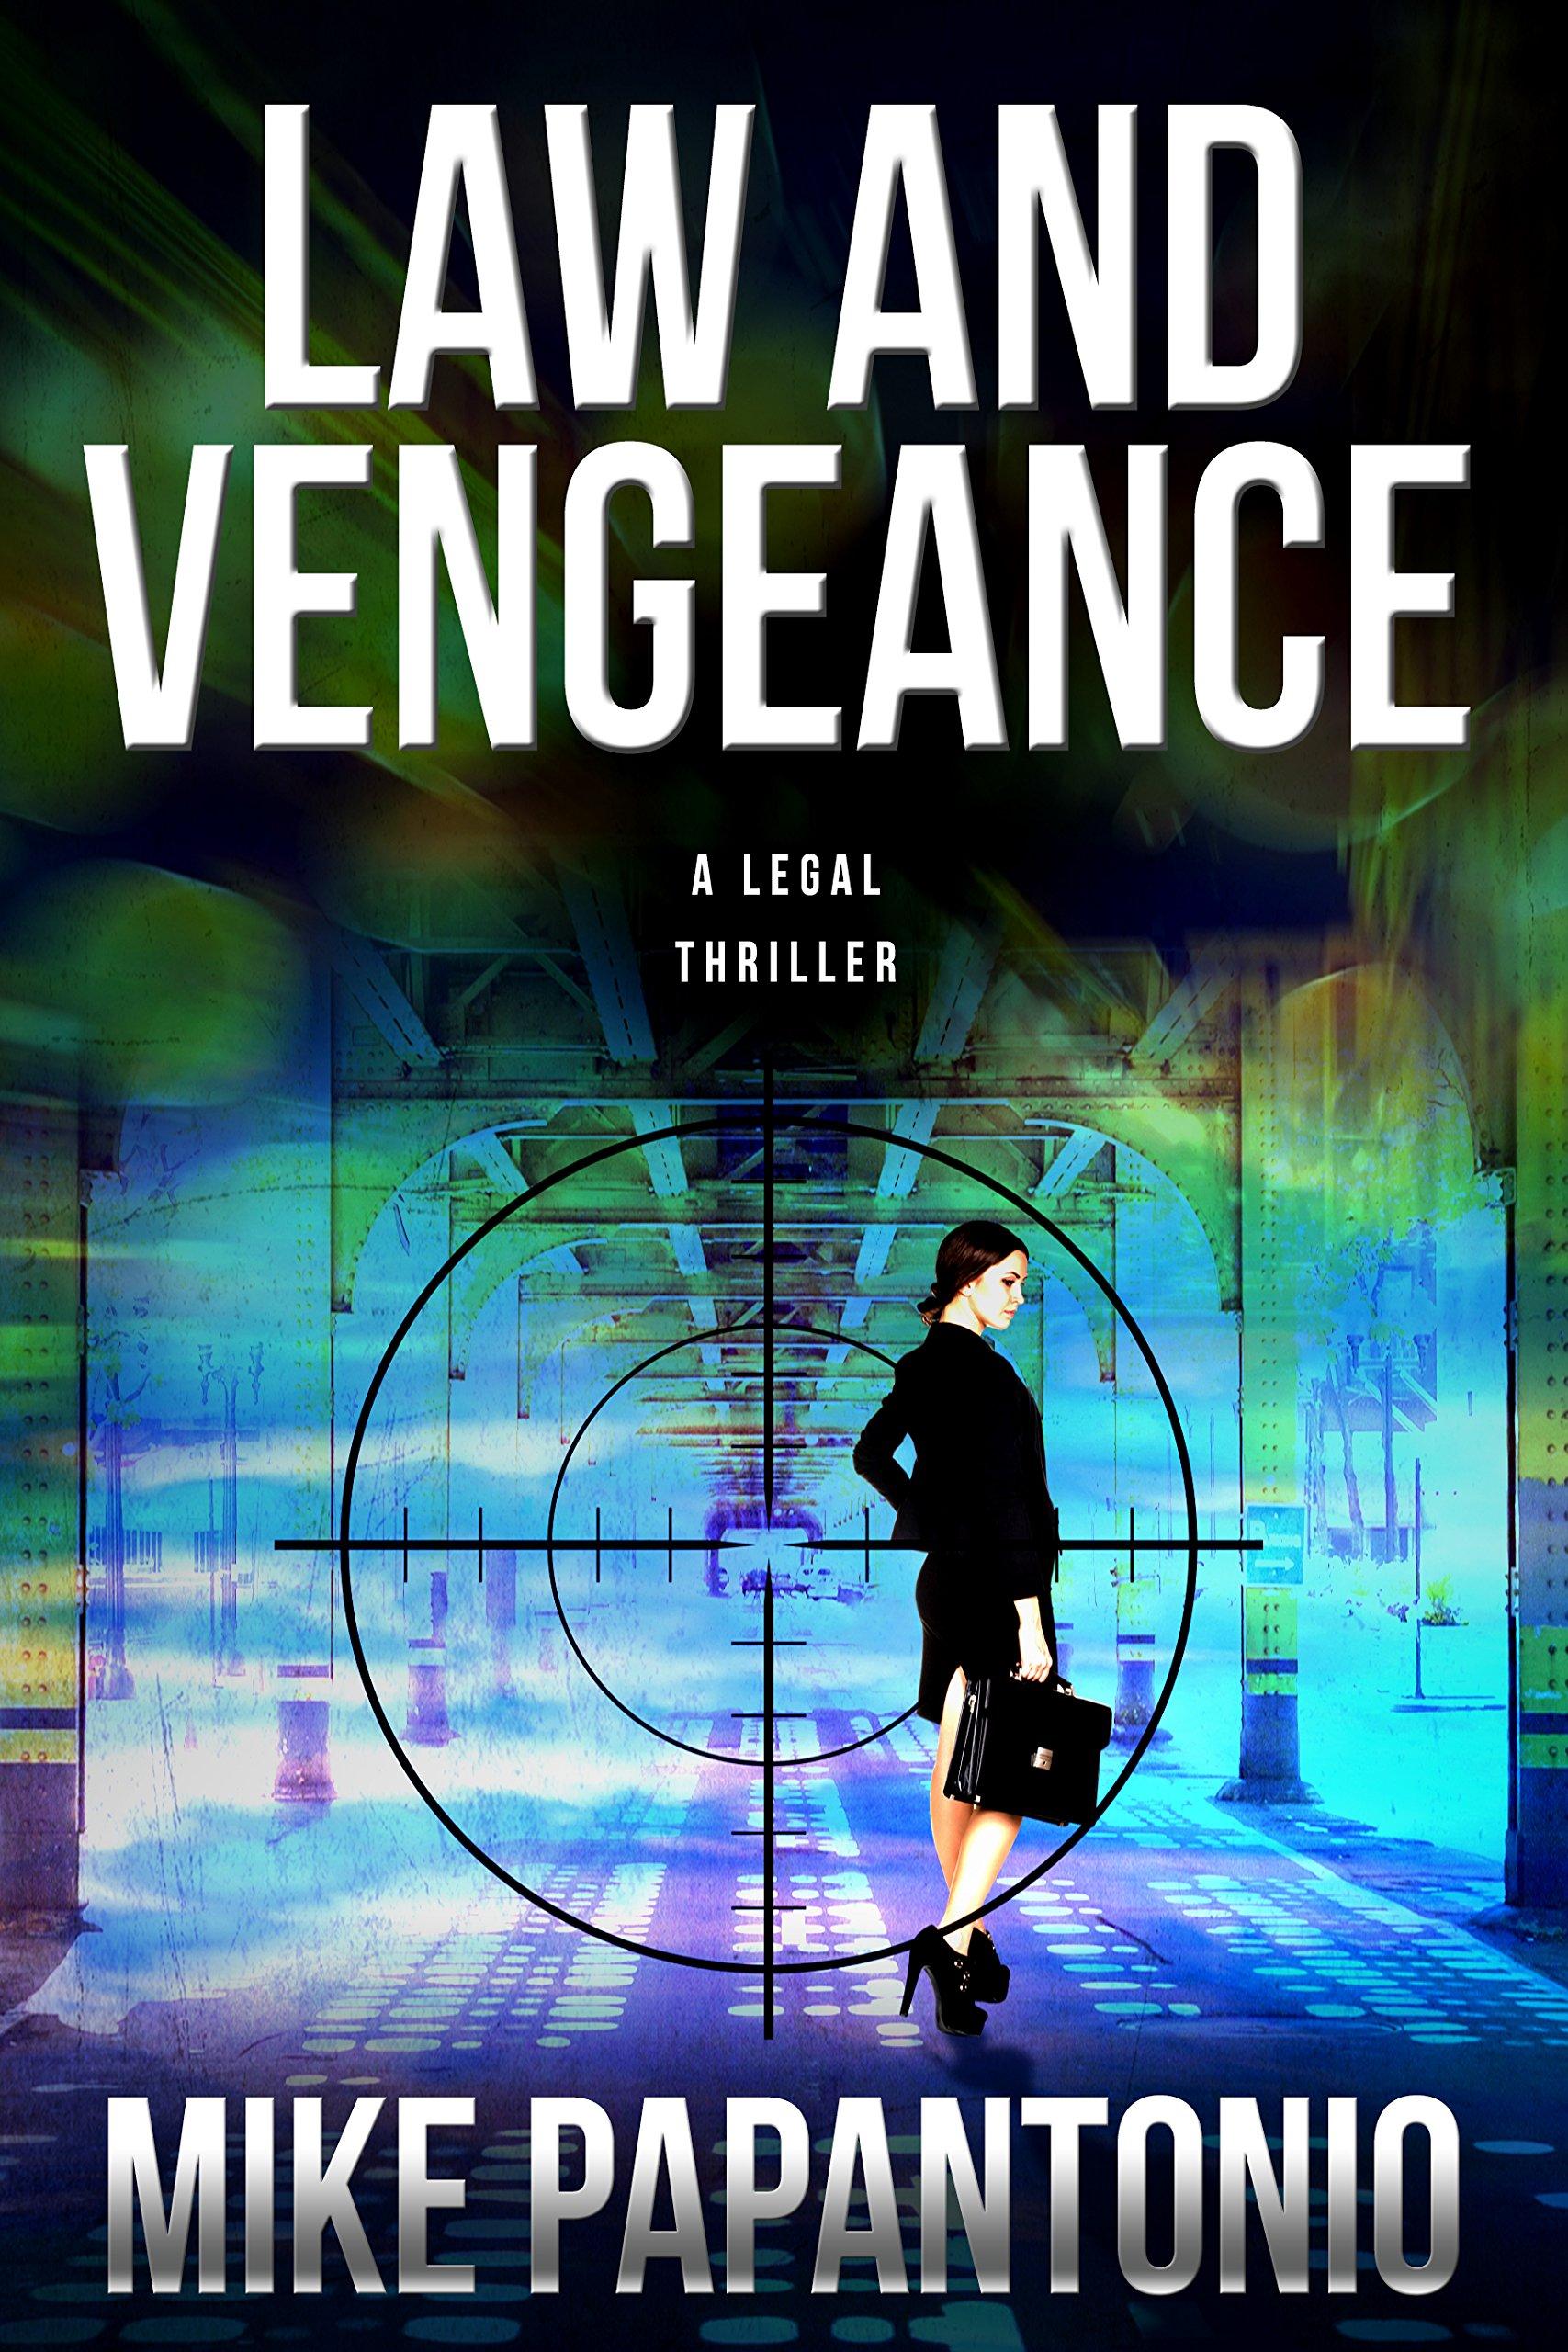 Law and Vengeance Mike Papantonio Amazon Books